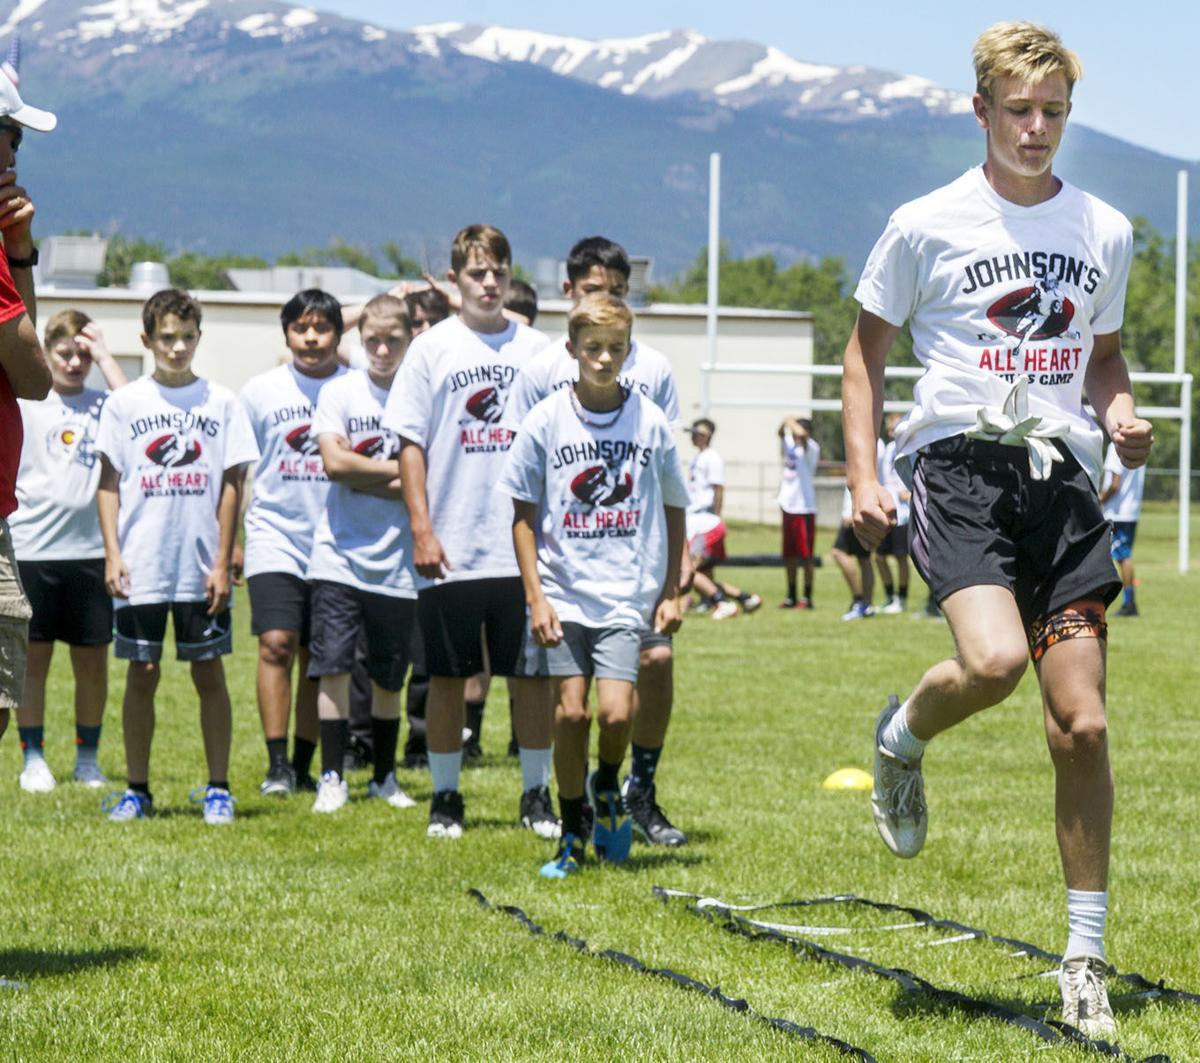 Johnson's All Heart camp